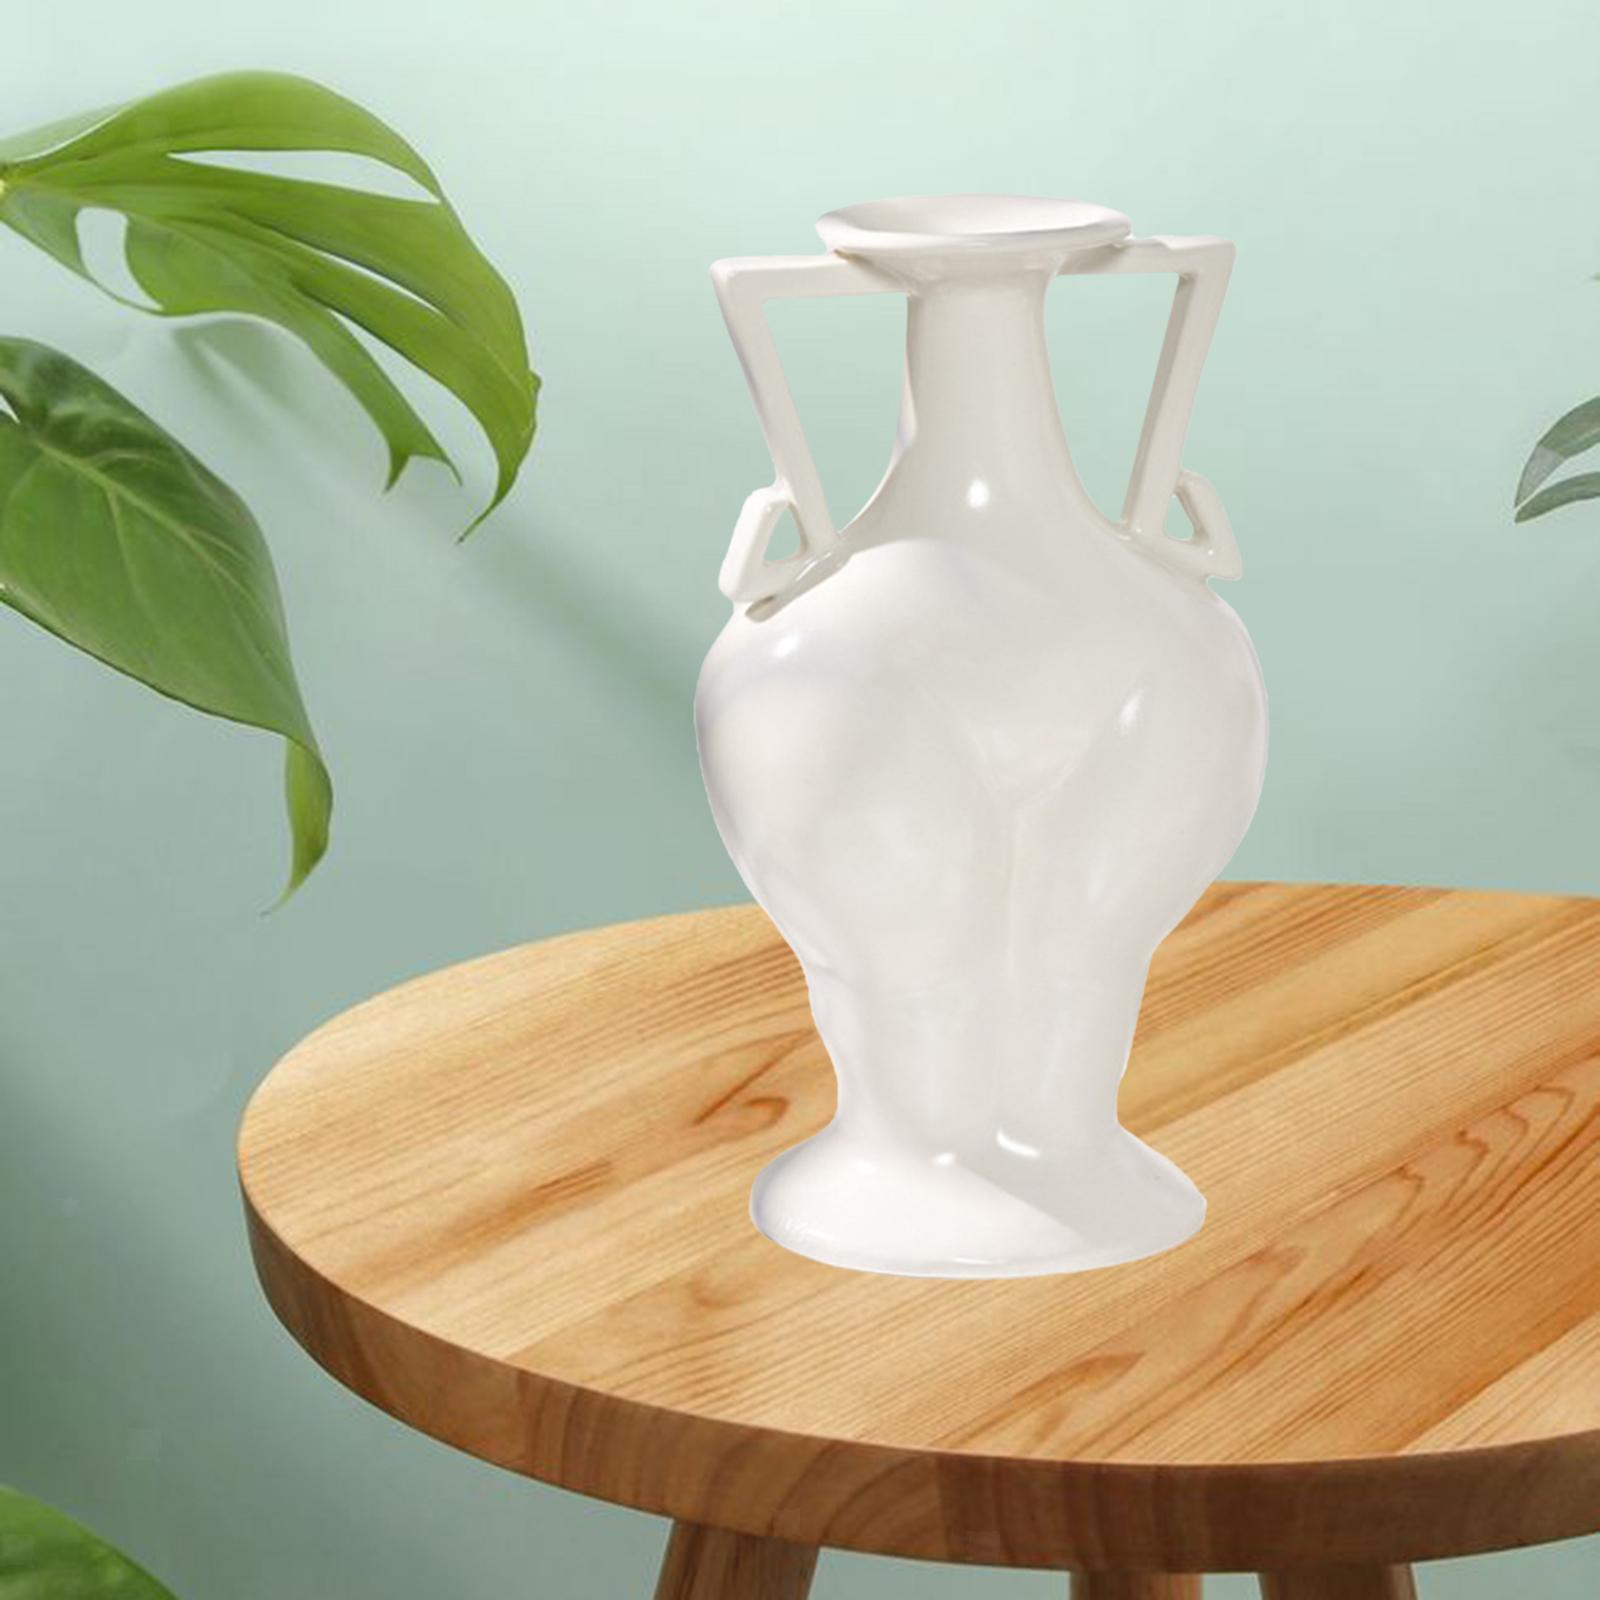 Indexbild 24 - Blumenvase Keramik Blumentöpfe Trockenblumenhalter Pflanzenvasen Wohnkultur